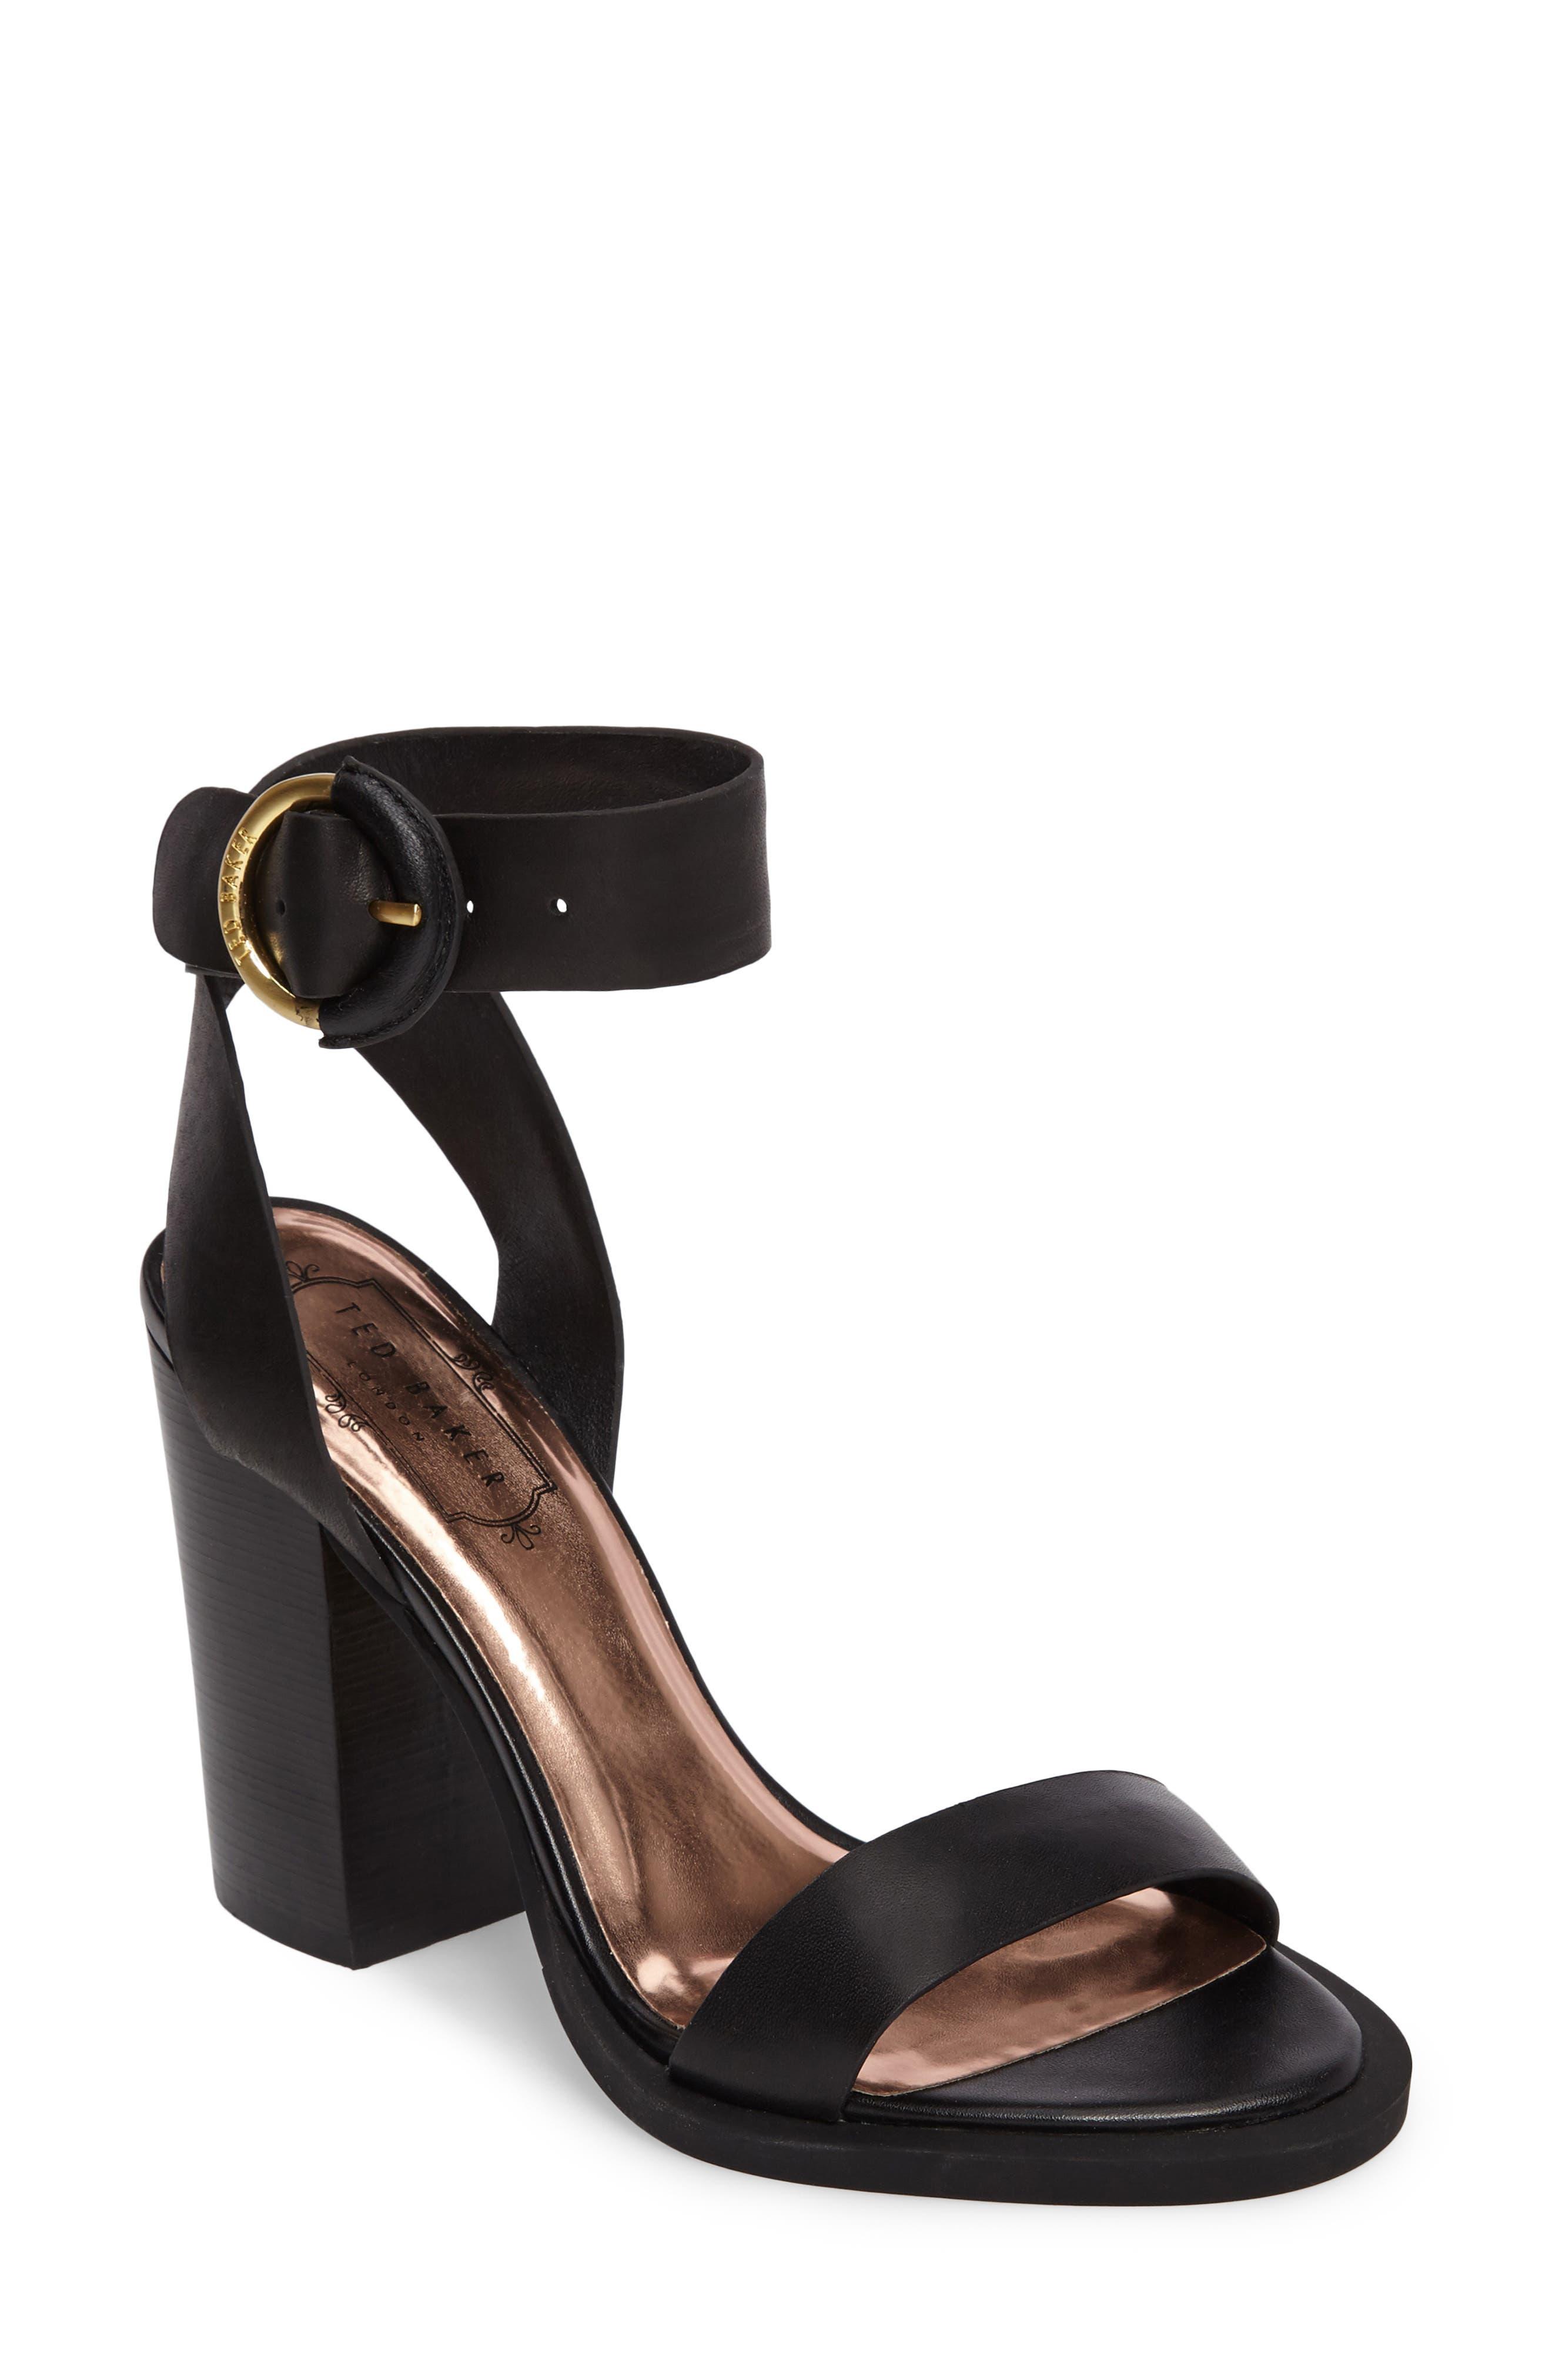 Betciy Ankle Strap Sandal,                         Main,                         color, 001